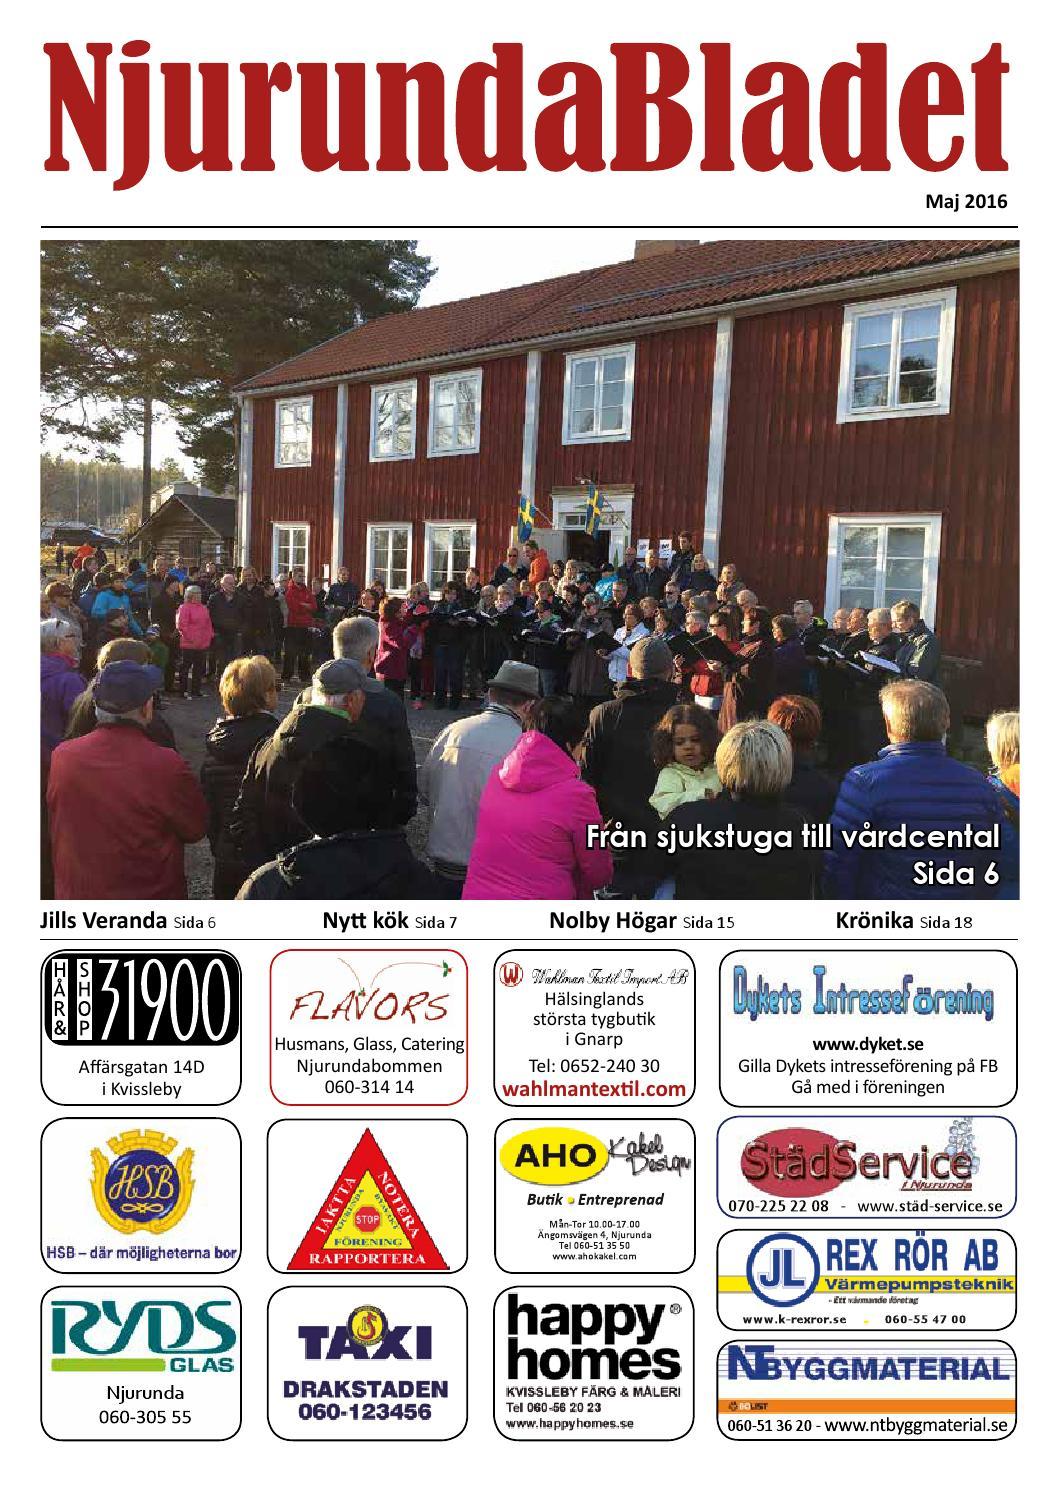 Rda Korset Njurunda - Rda Korset Sundsvall kommun